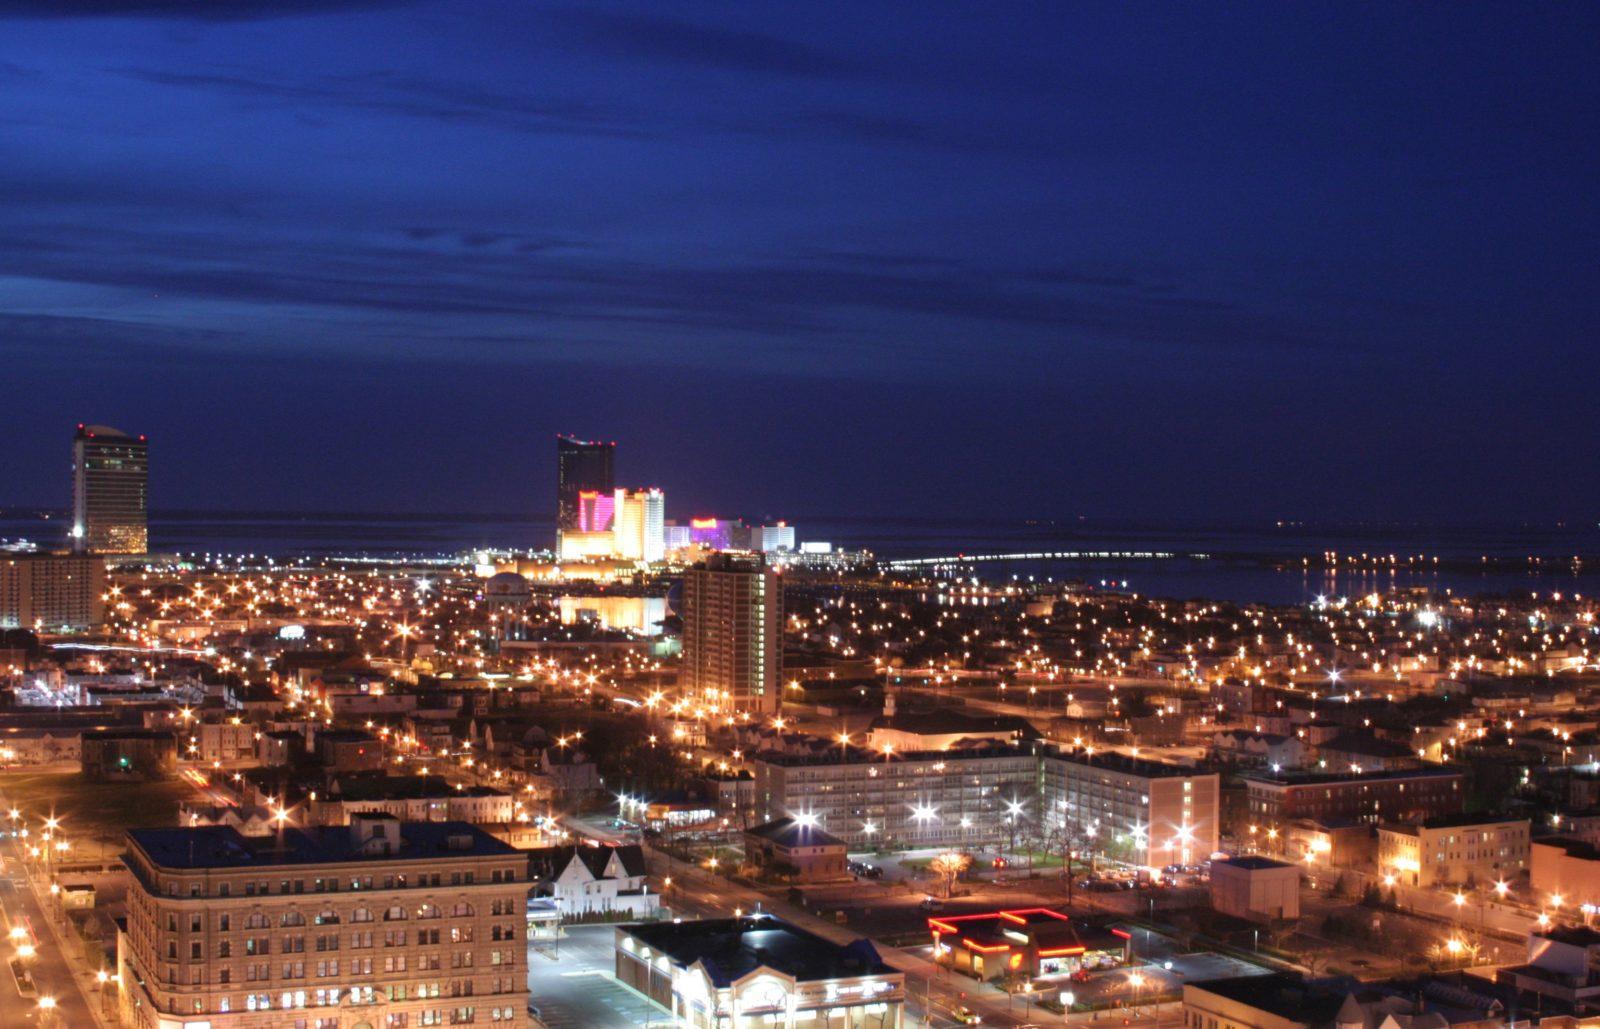 How Far Is Atlantic City From New York City?